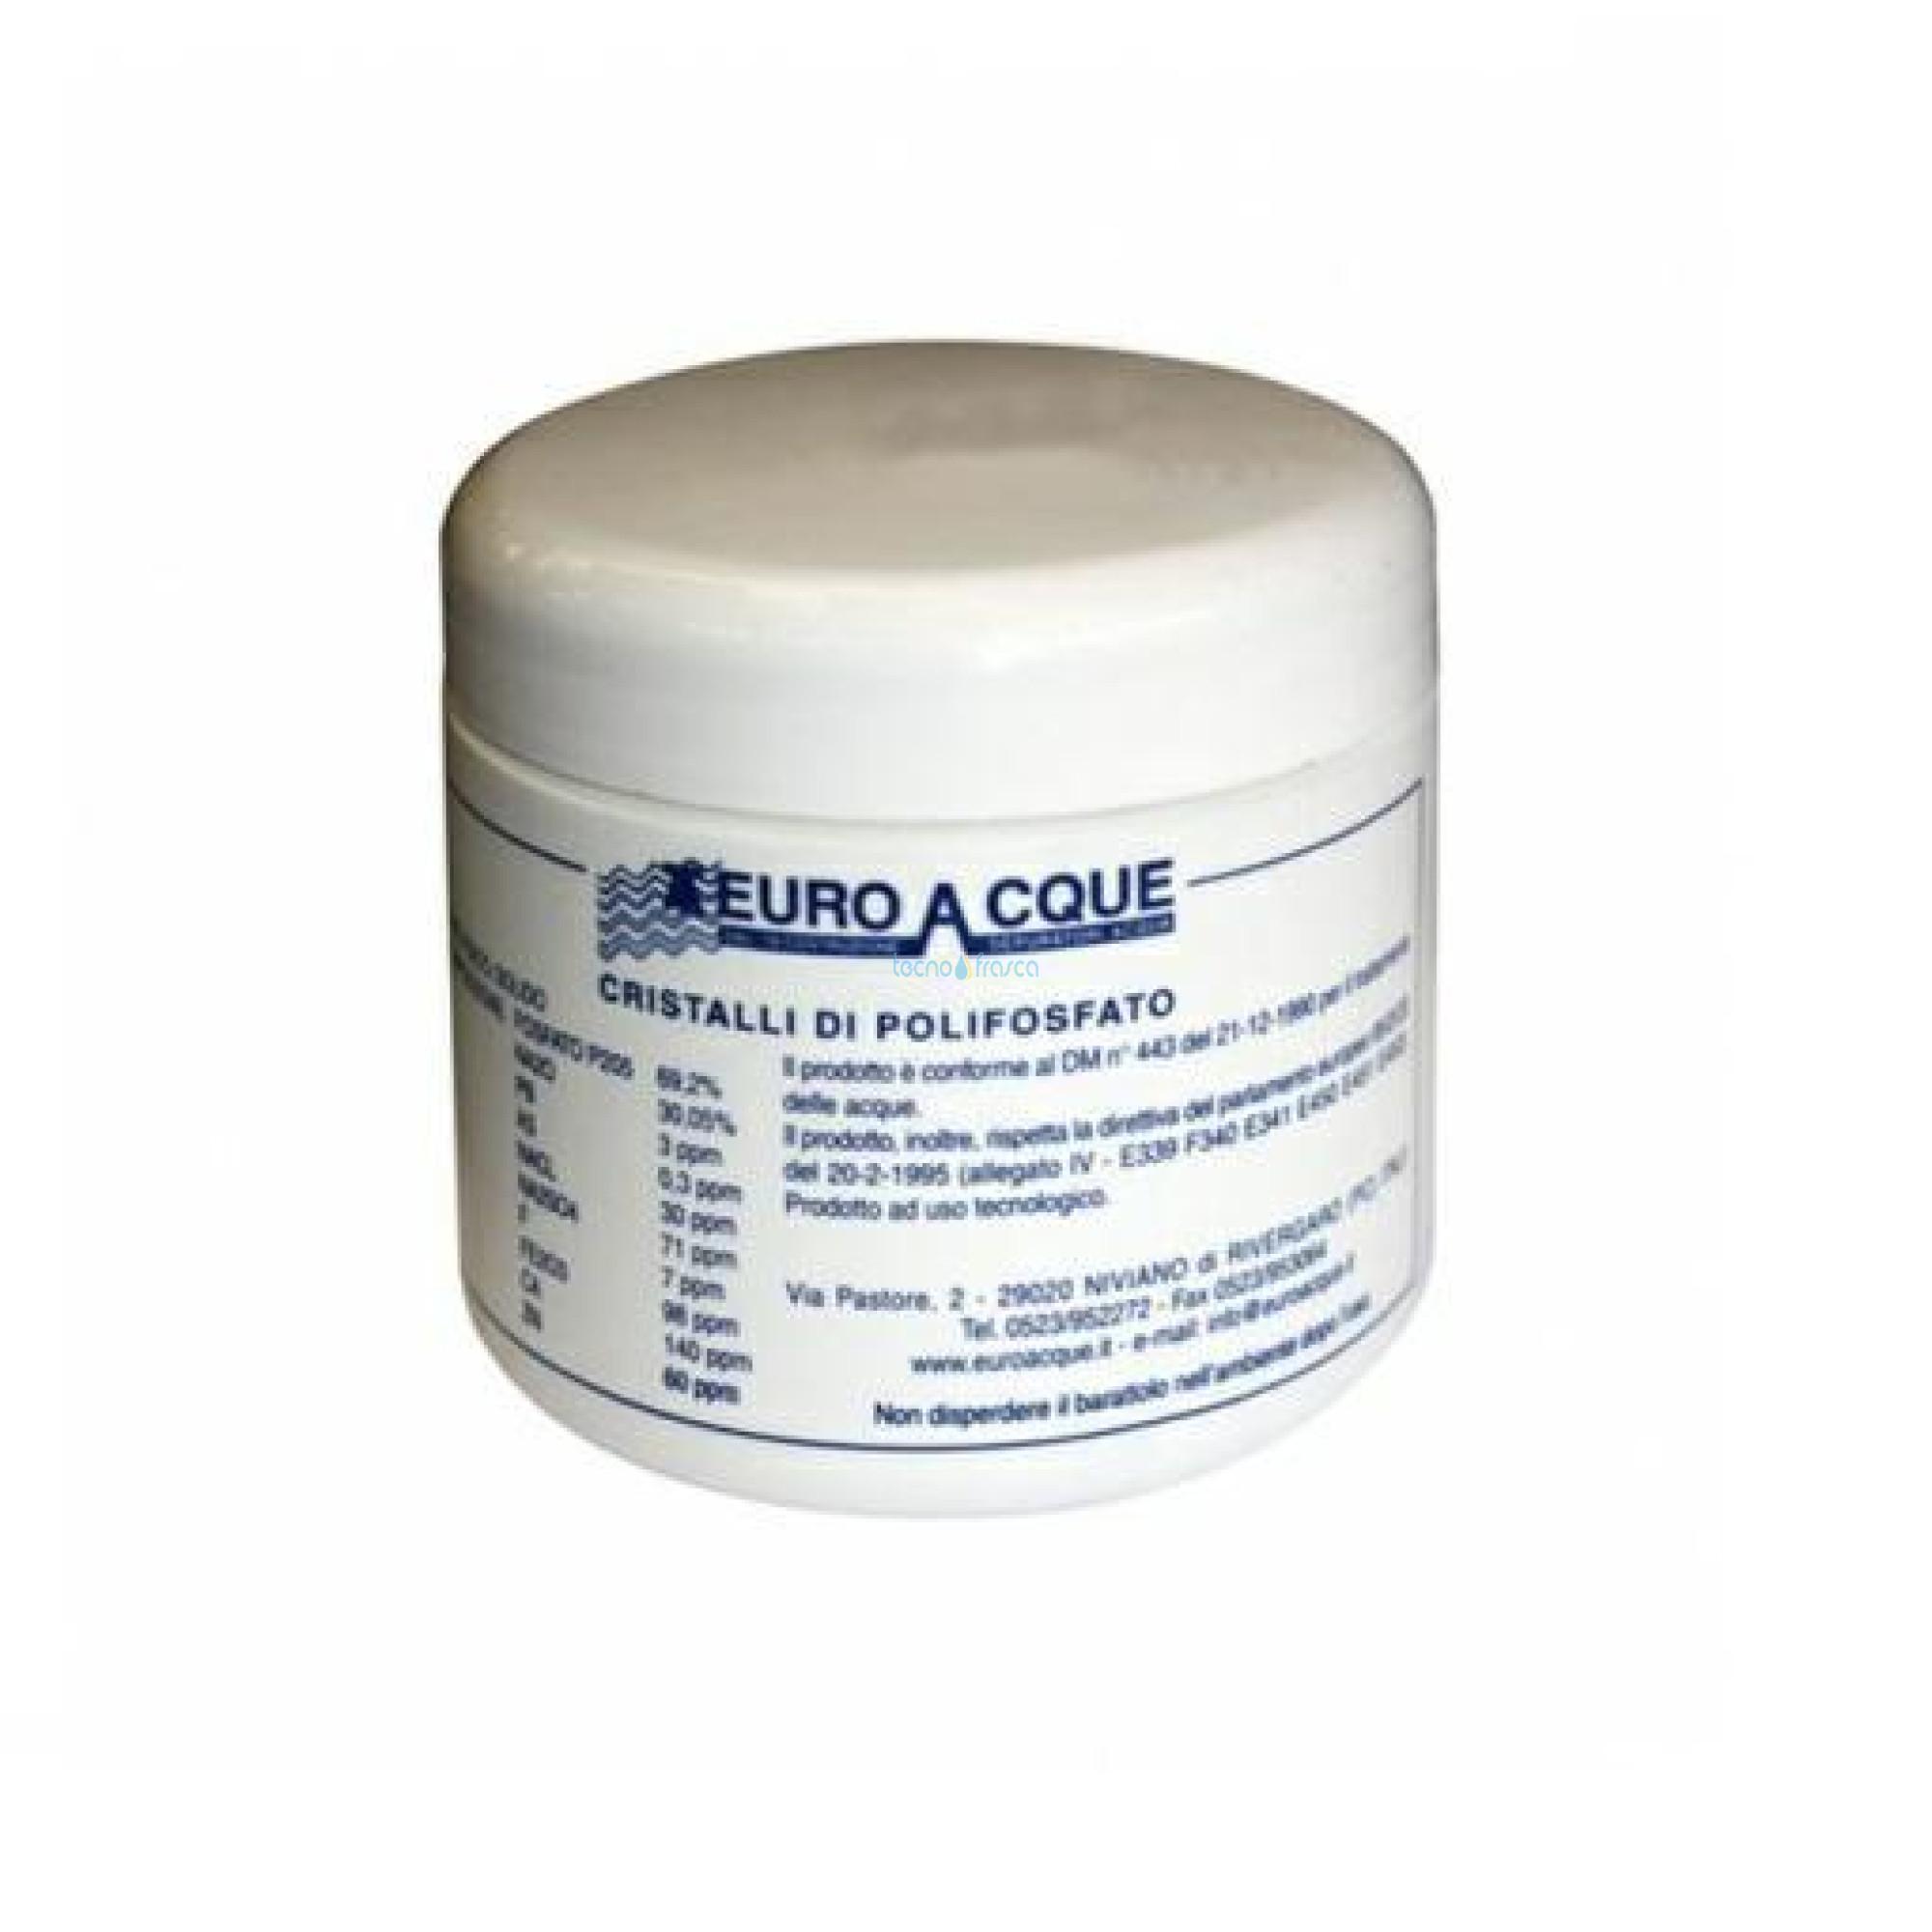 Polifostati Anticalcare in cristalli Euroacque 1 kg crist001